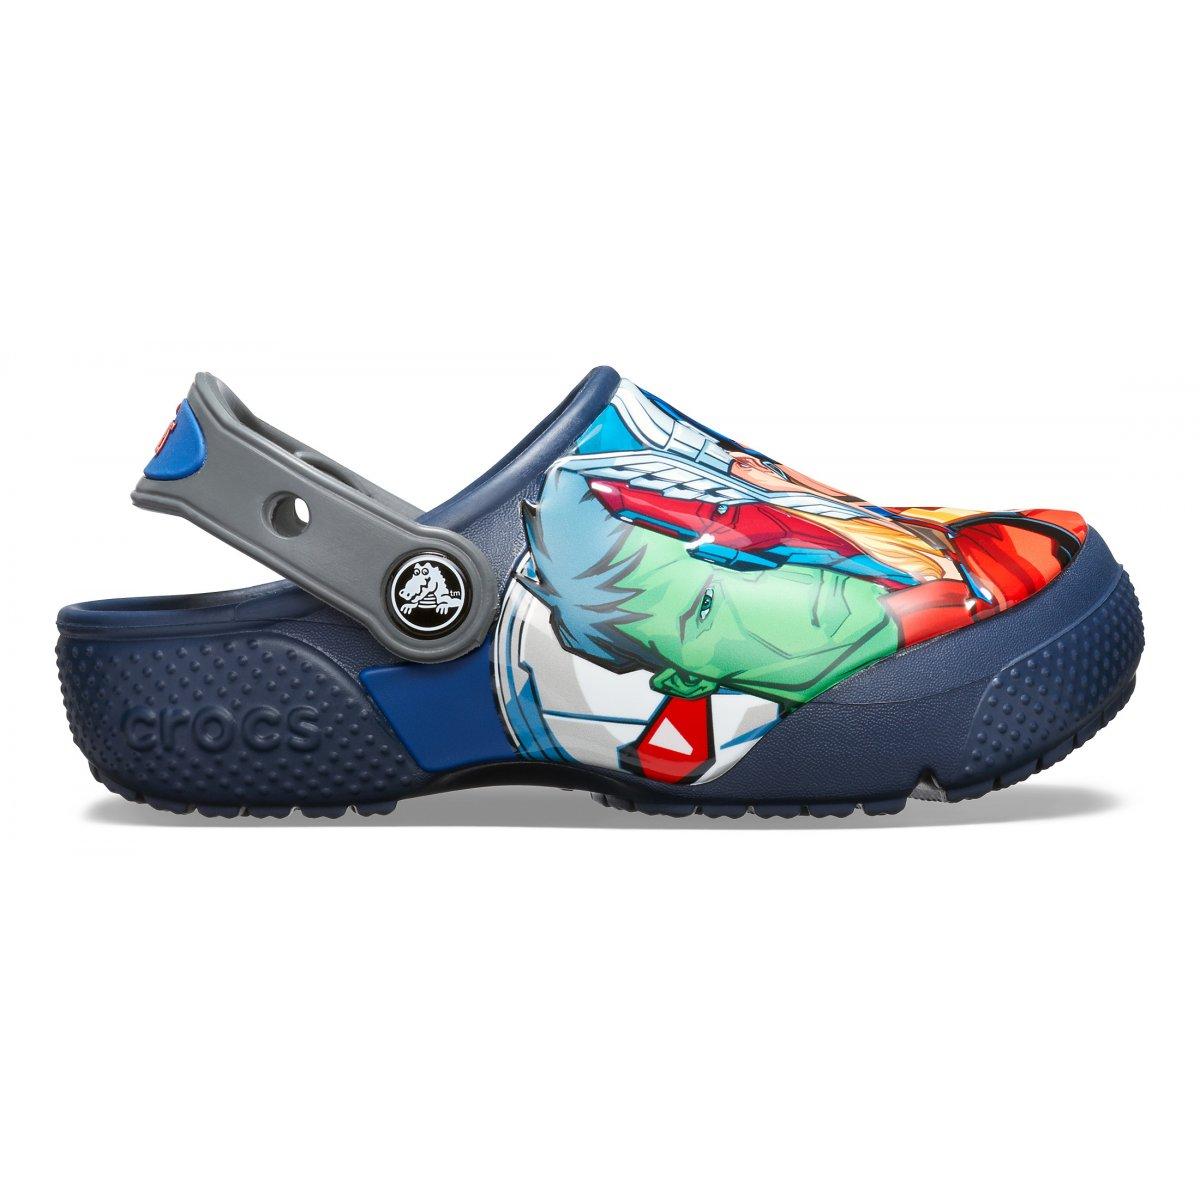 874a097c6 Crocs Fun Lab Marvel® Multi Clog K - Collezione Estiva Footwear Bambino